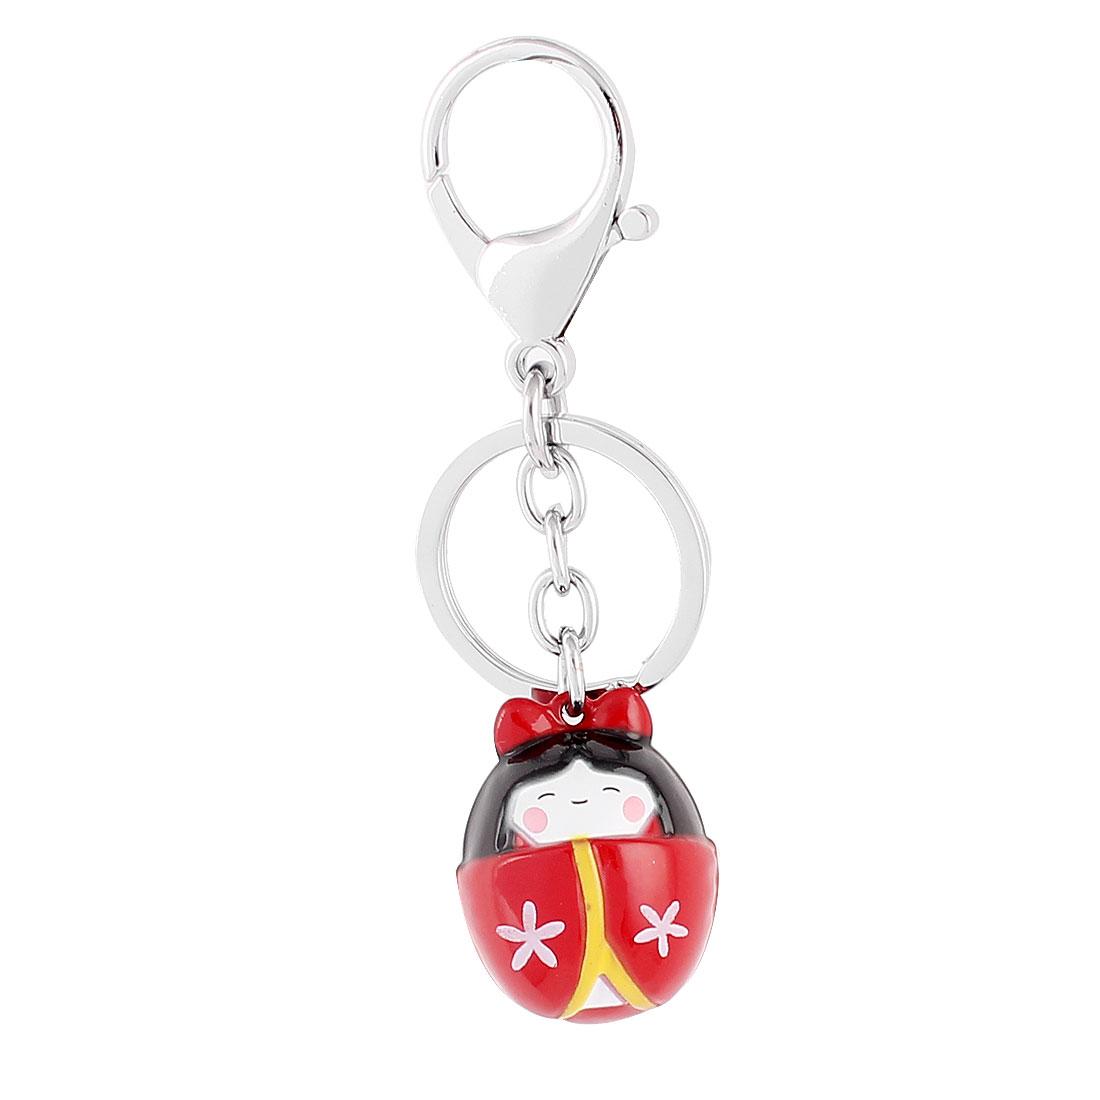 Red Black Dangling Girl Shape Bells Decor Key Ring Keychain Keyring 10cm